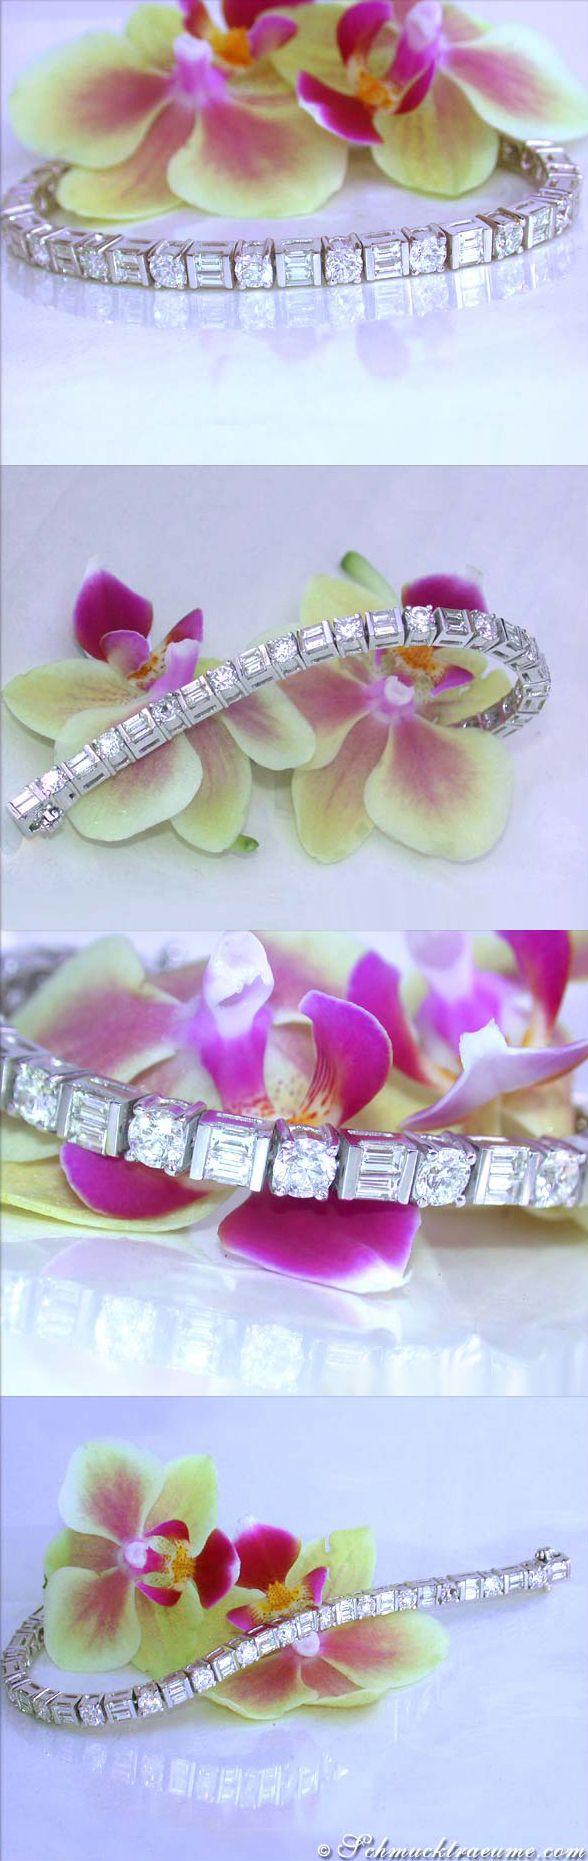 Ausgesuchtes Diamanten Armband | Exquisite Diamond Bracelet | 9,41 ct. G SI, WG 18k | Visit: schmucktraeume.com | Like: https://www.facebook.com/Noble-Juwelen-150871984924926/